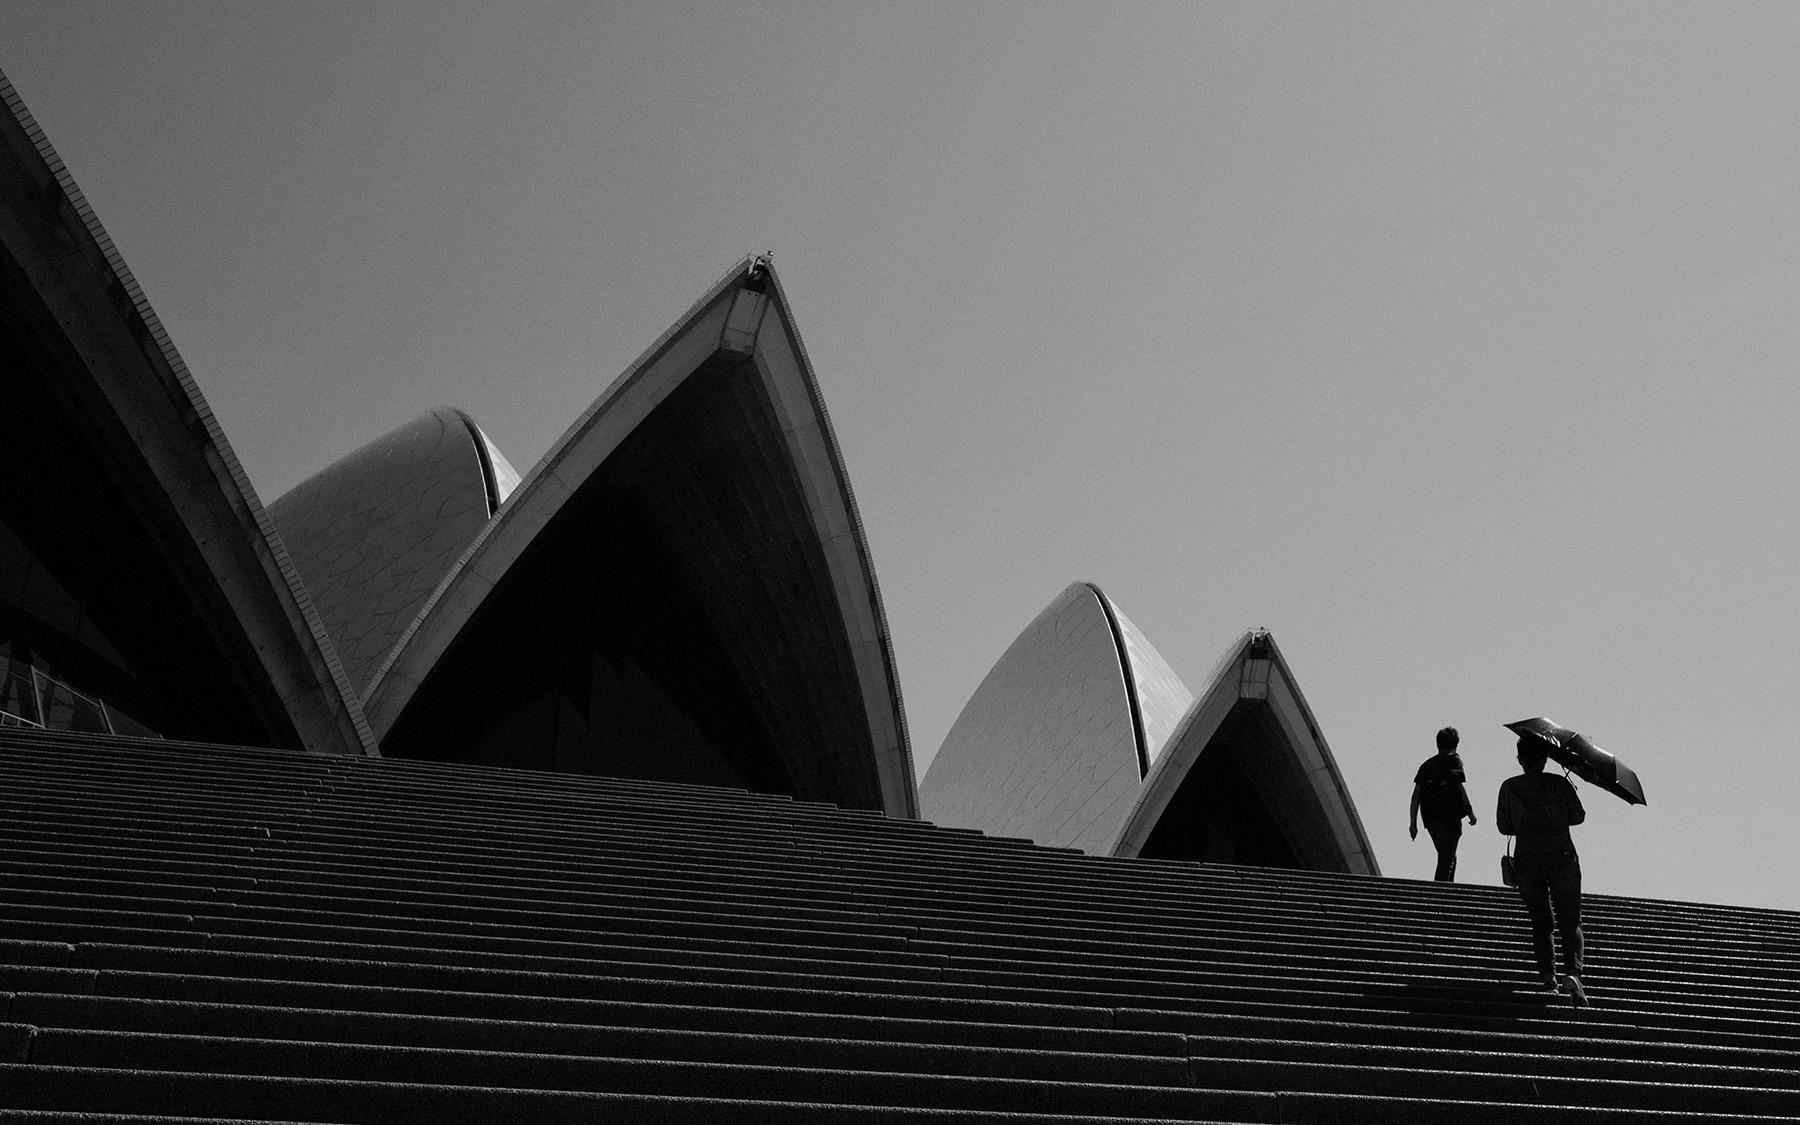 Sydney Opera House figures